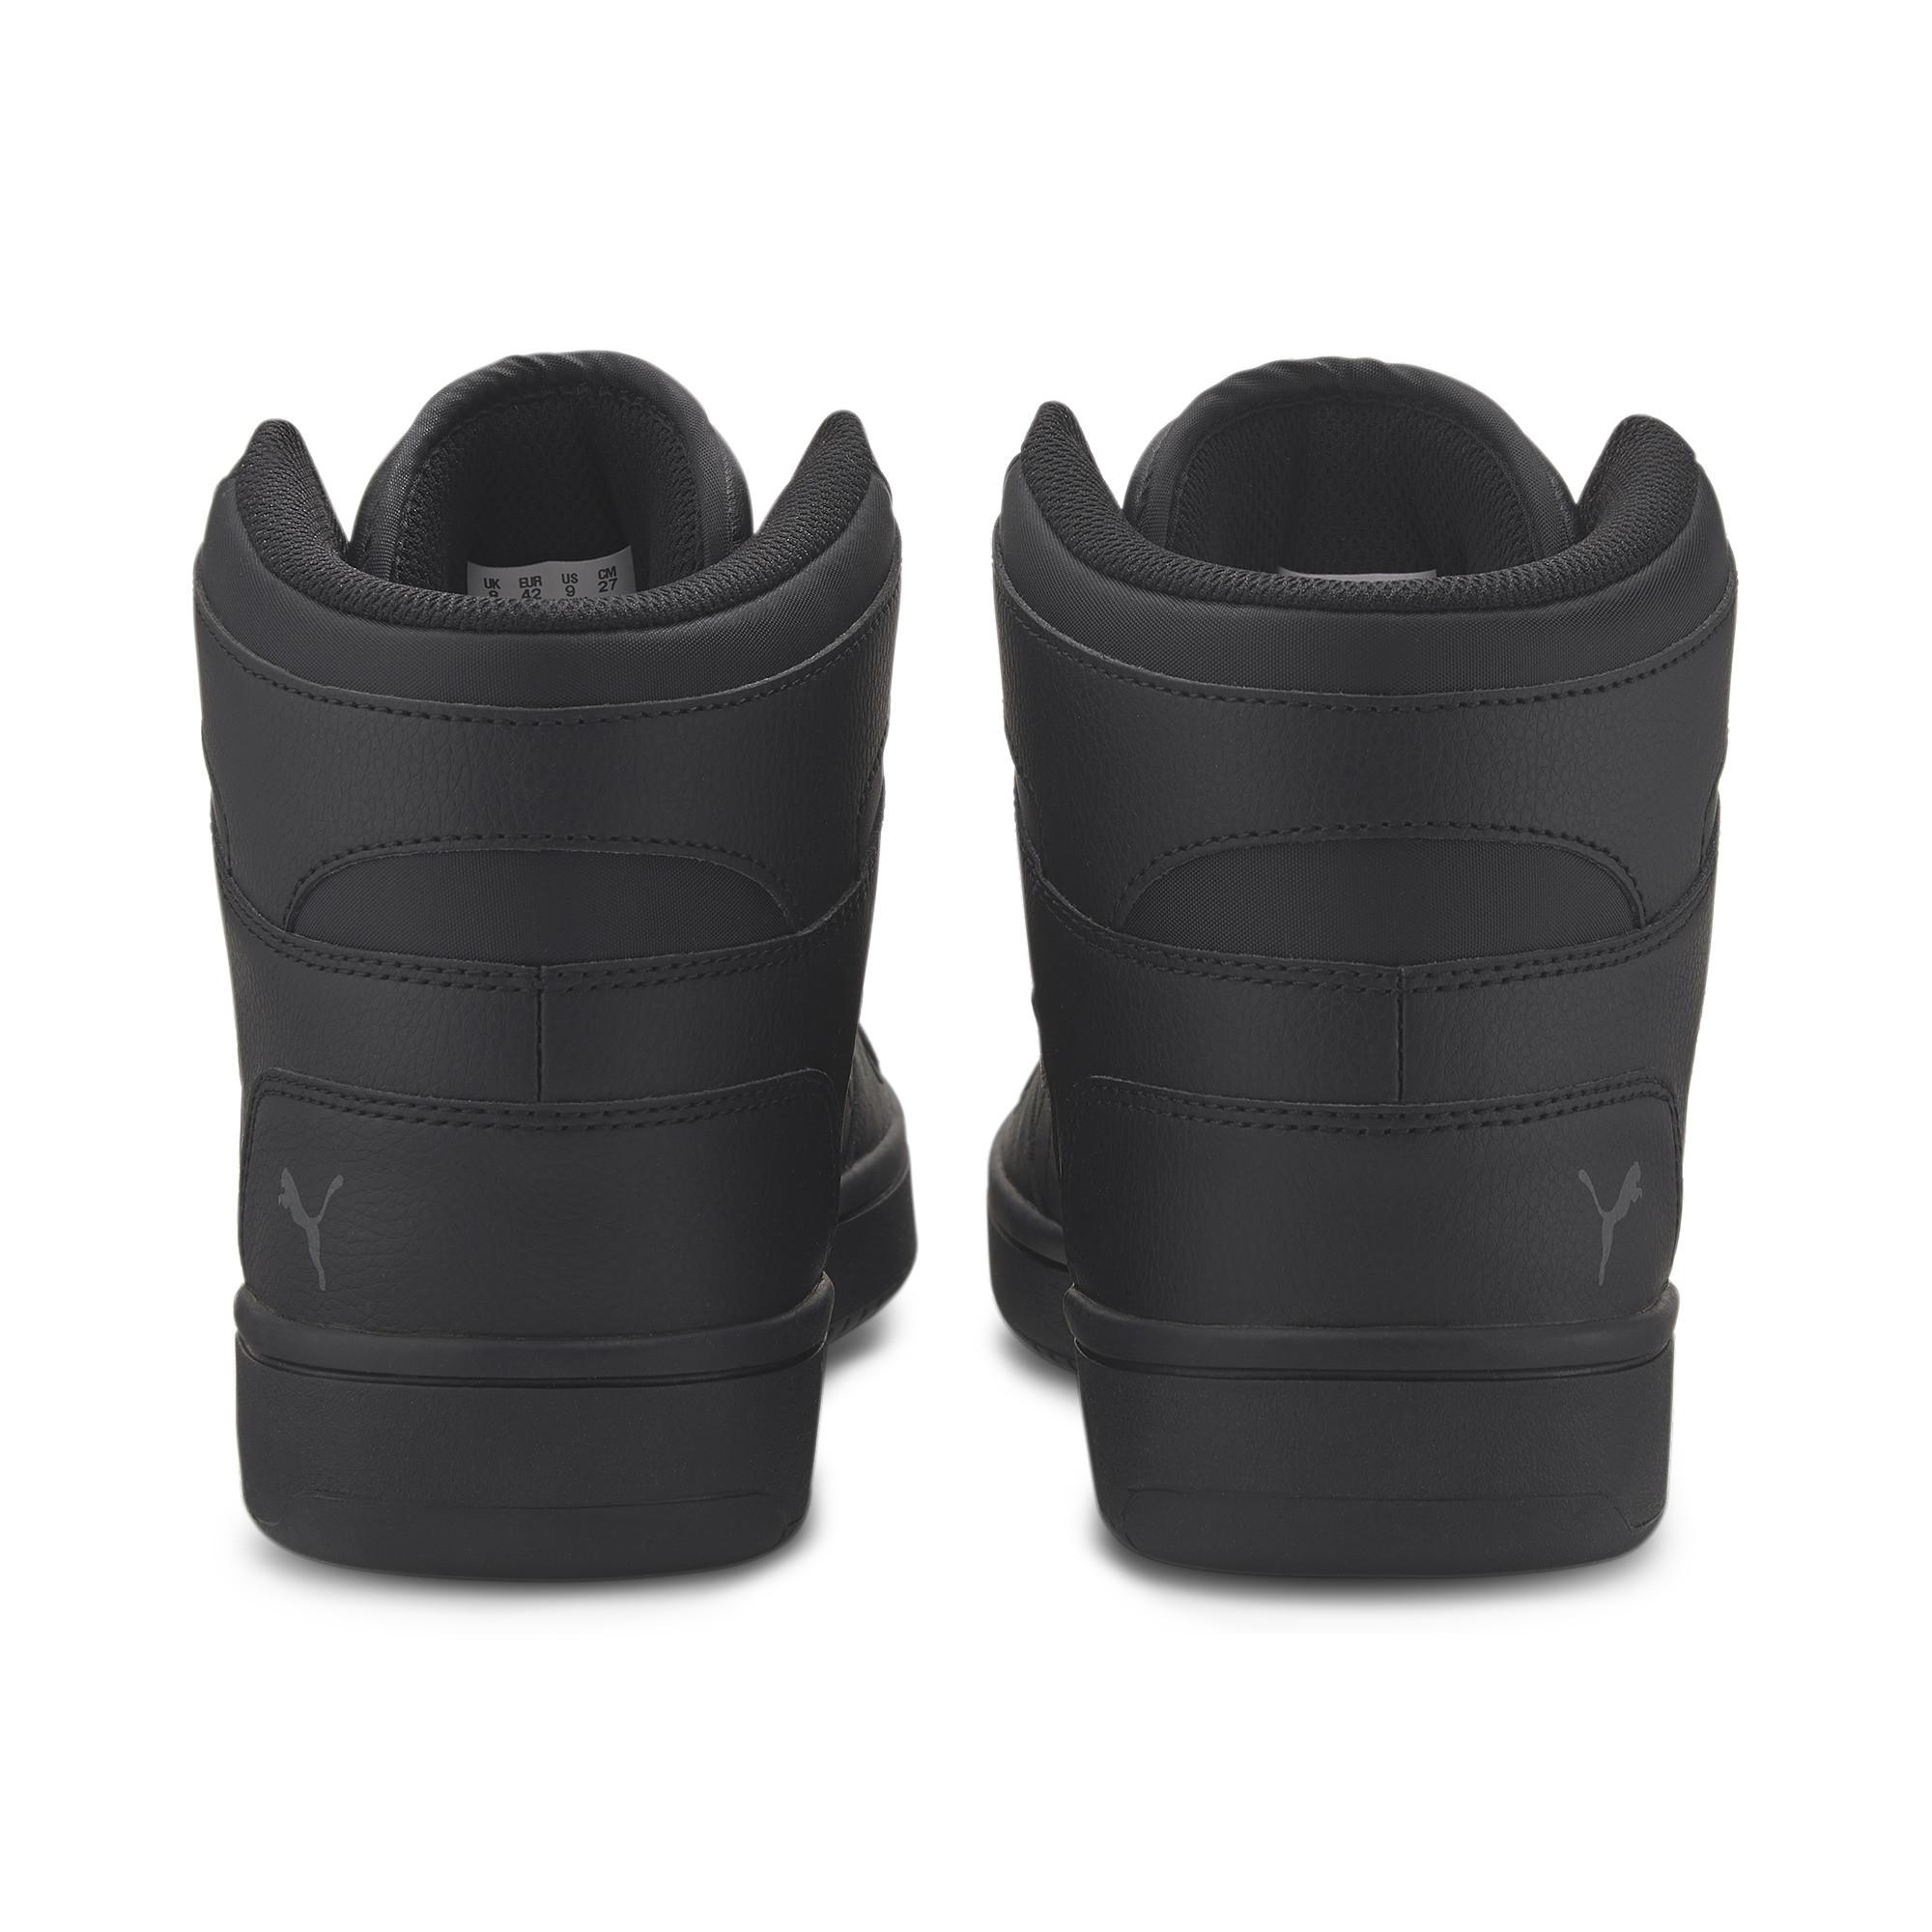 PUMA-PUMA-Rebound-LayUp-Men-039-s-Sneakers-Men-Mid-Boot-Basics thumbnail 26